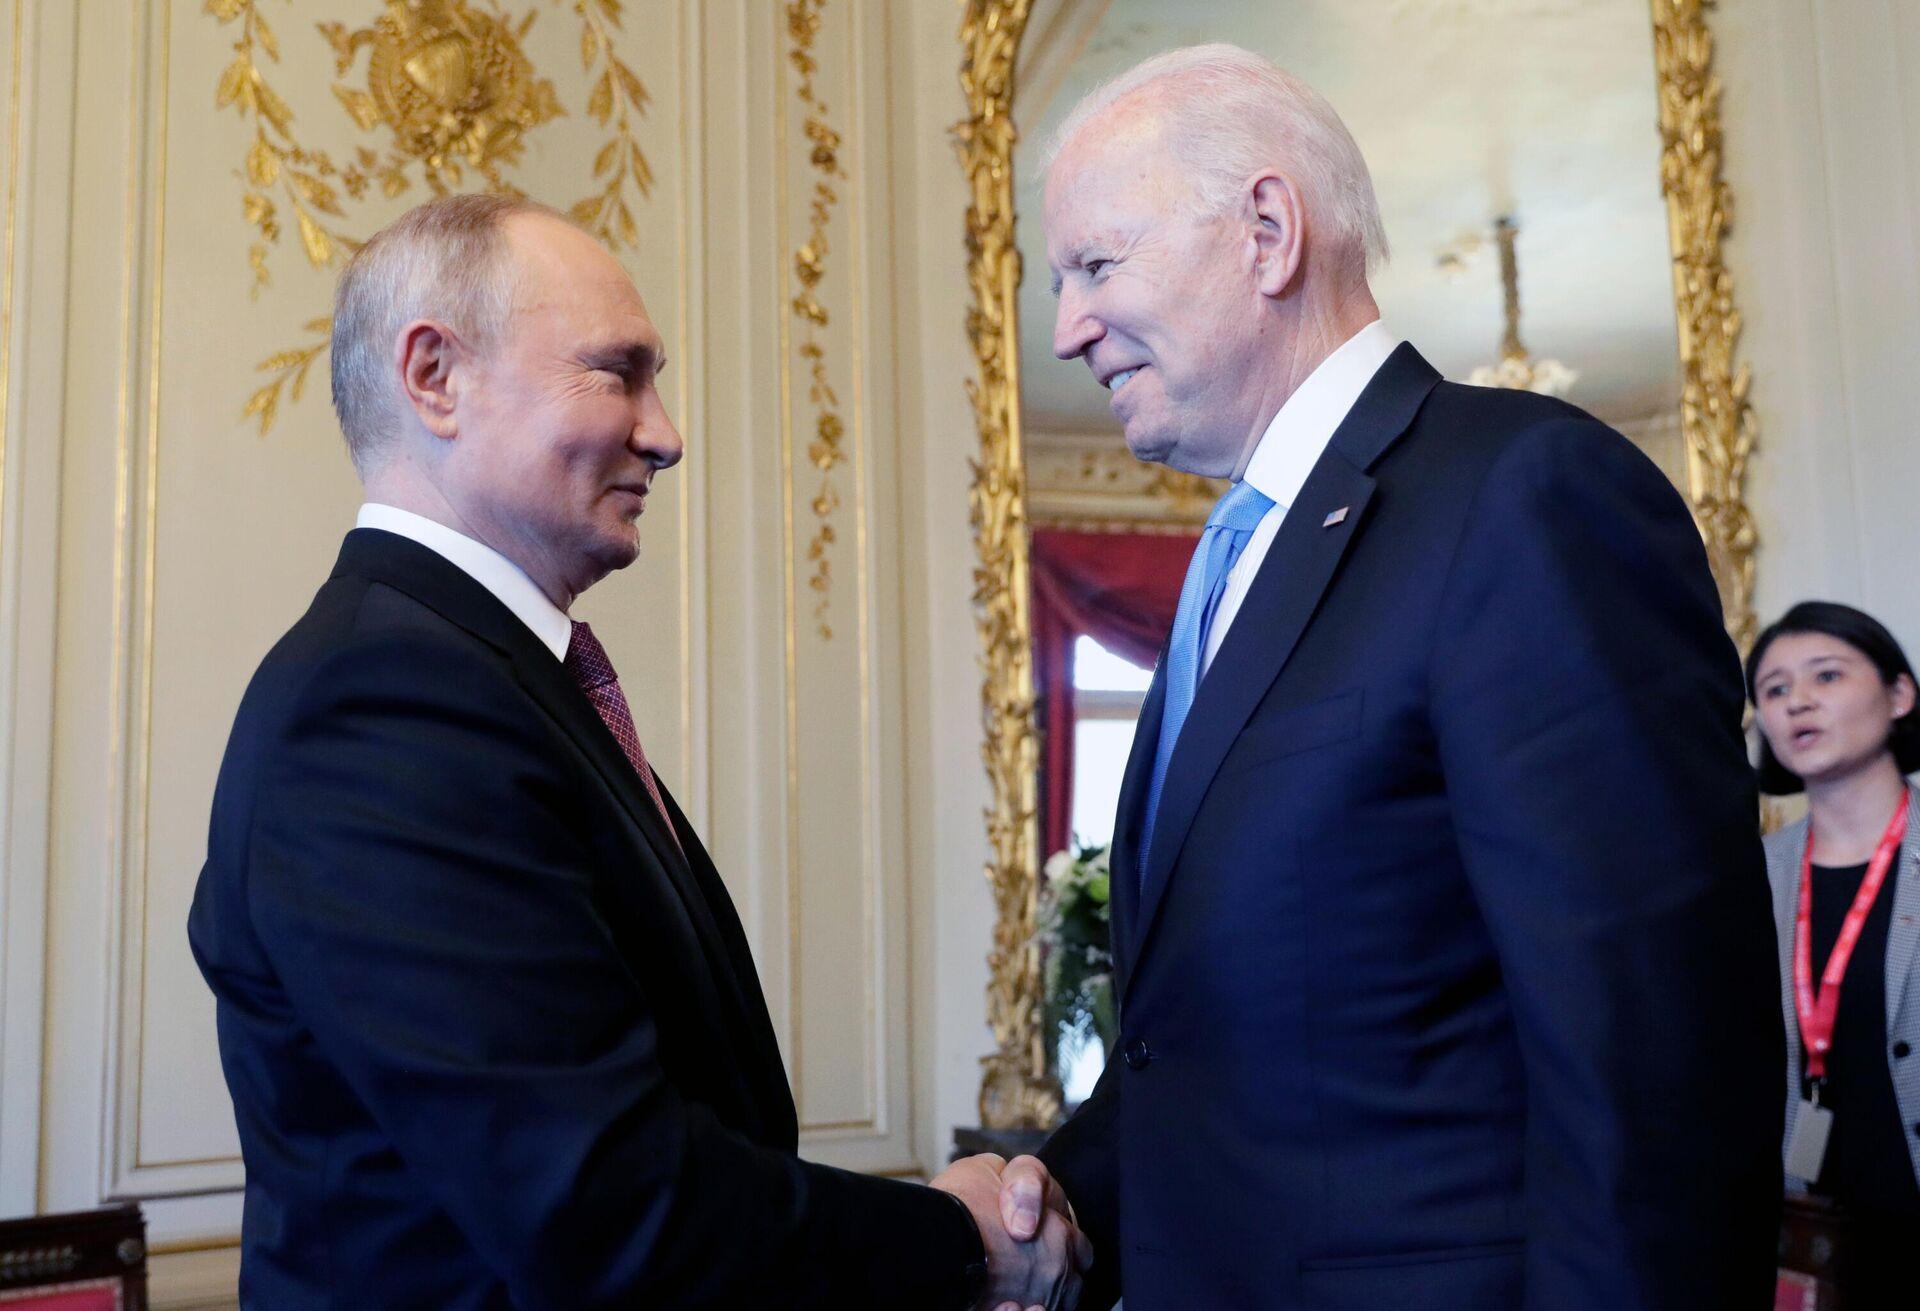 L'incontro bilaterale tra Putin e Biden a Ginevra - Sputnik Italia, 1920, 10.09.2021